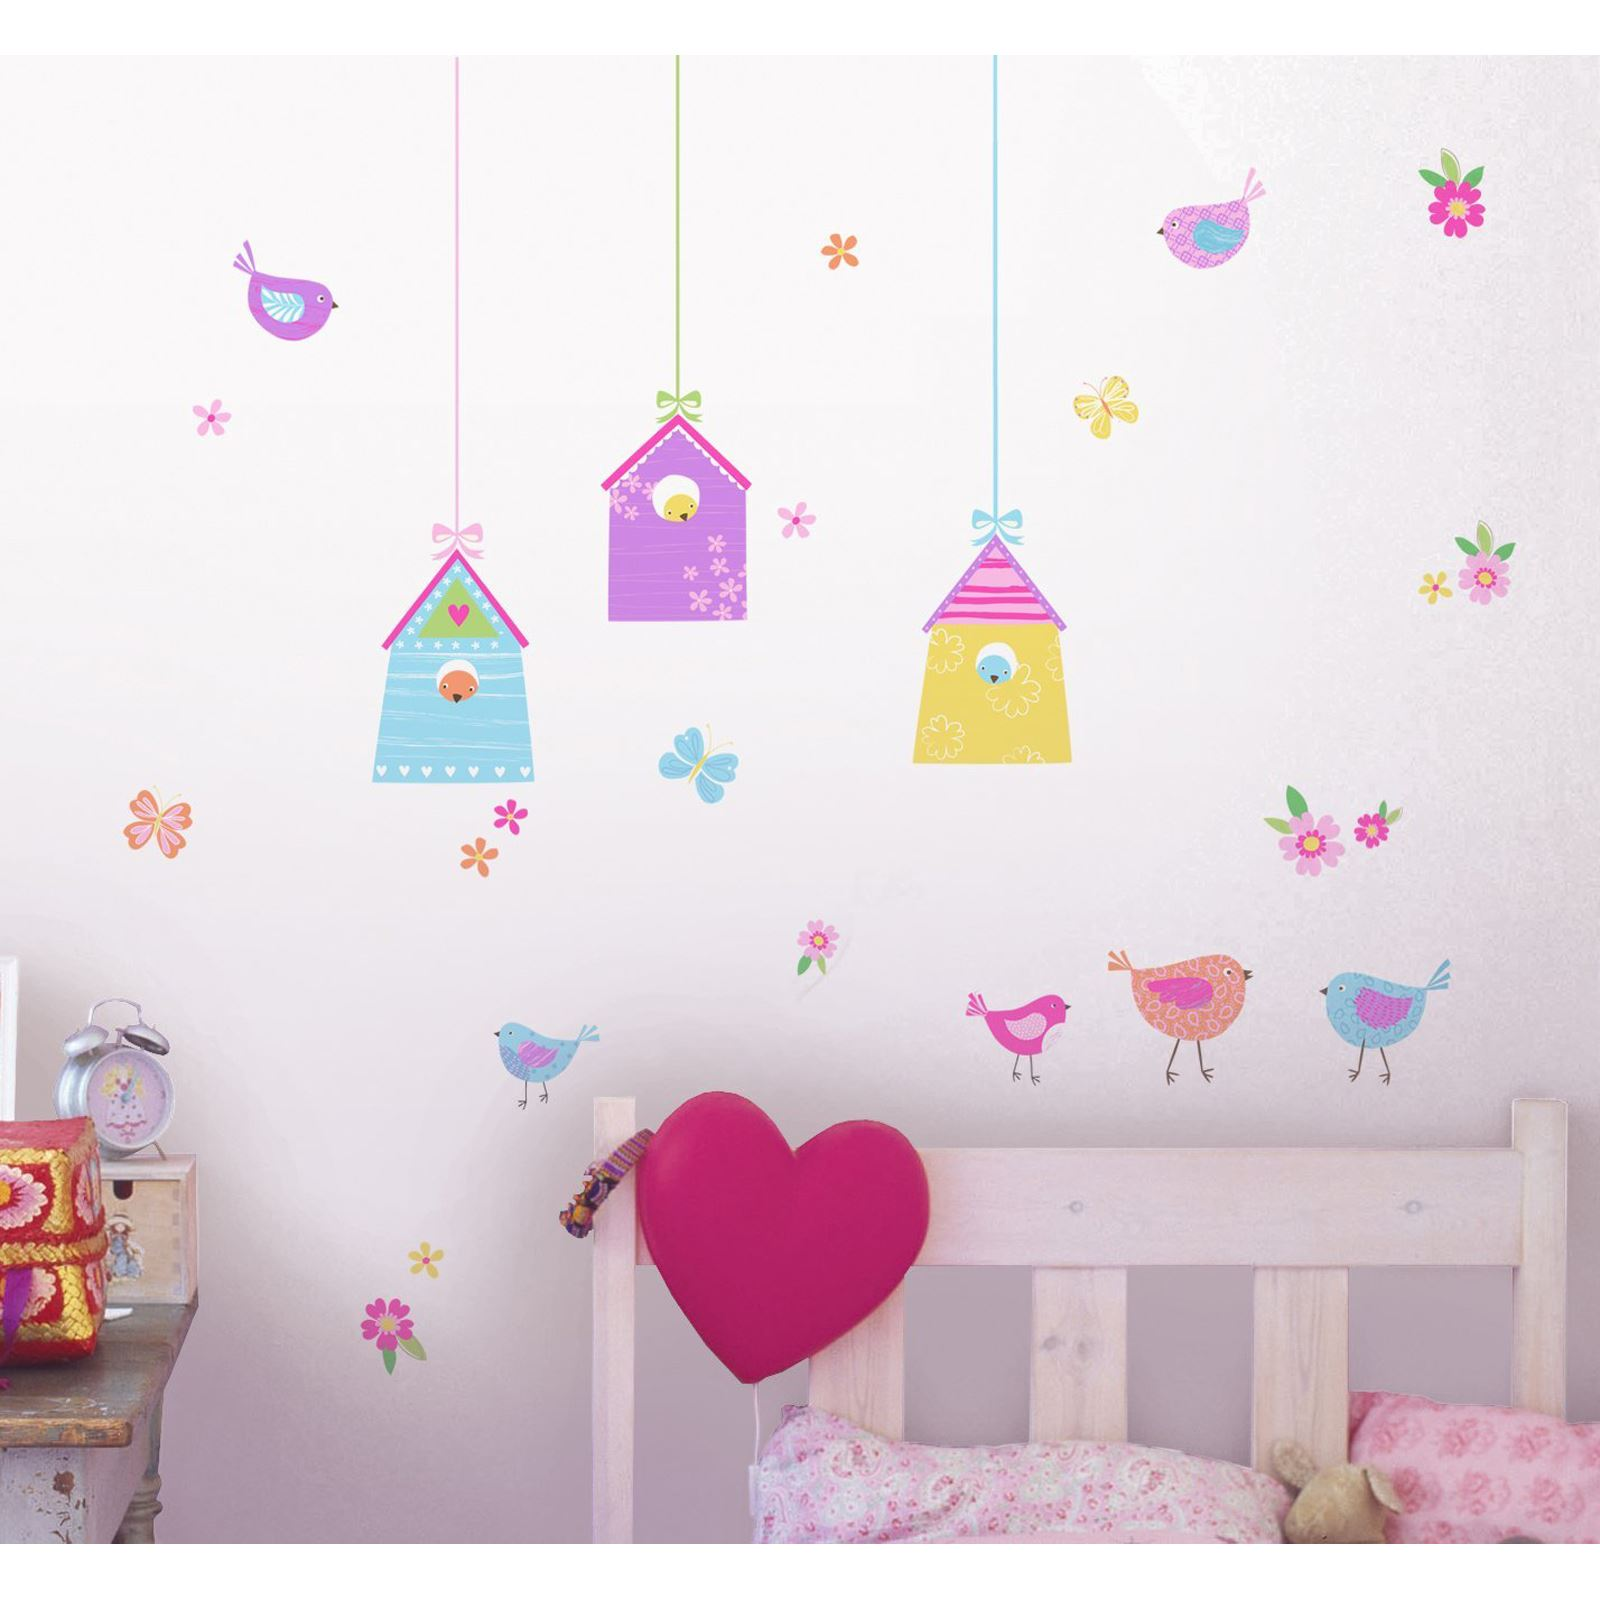 Bird Houses 35 Wall Stickers New Kids Bedroom Decor Butterflies Ebay